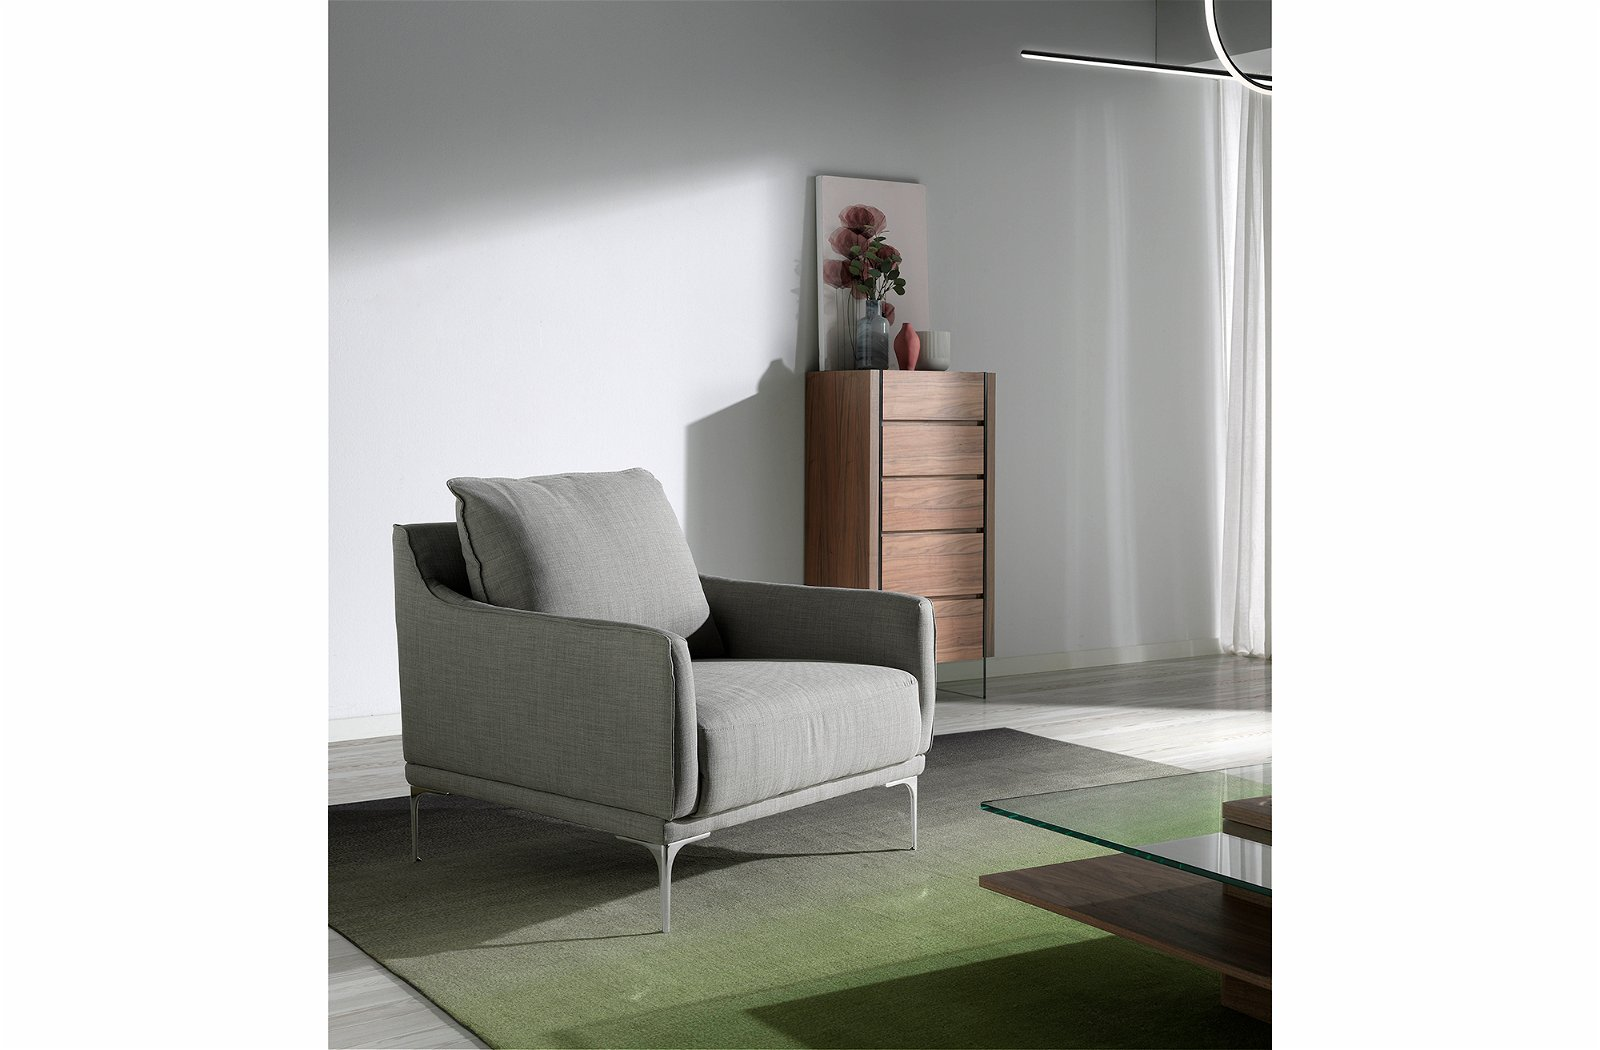 Butaca tapizada en tela patas cromadas Taormina Angel cerda